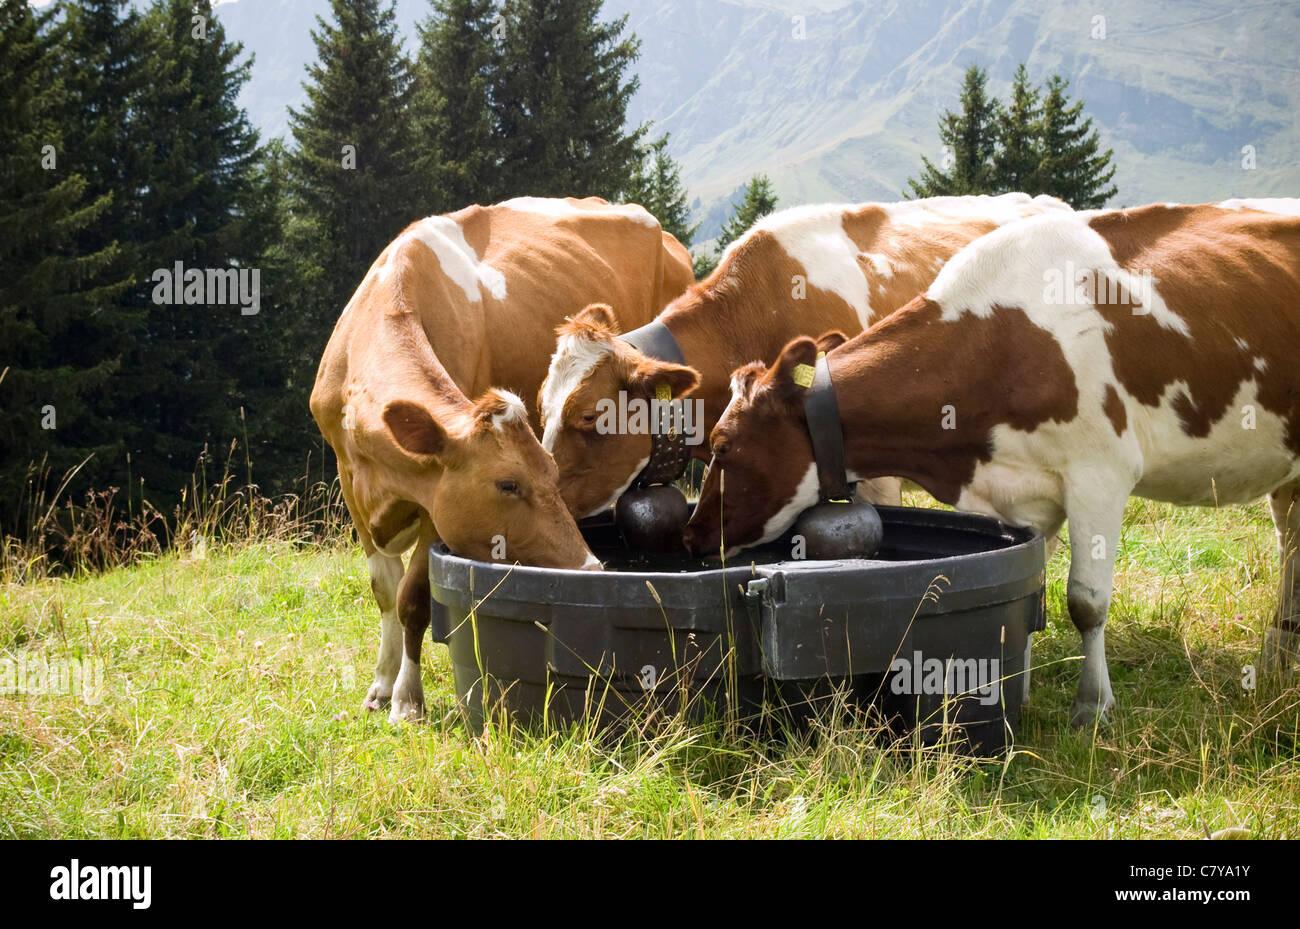 Schweiz, Kühe, Tiere, Alpen, Schweiz Sonne, Kühe, Kuh trinken, Glocken Stockbild